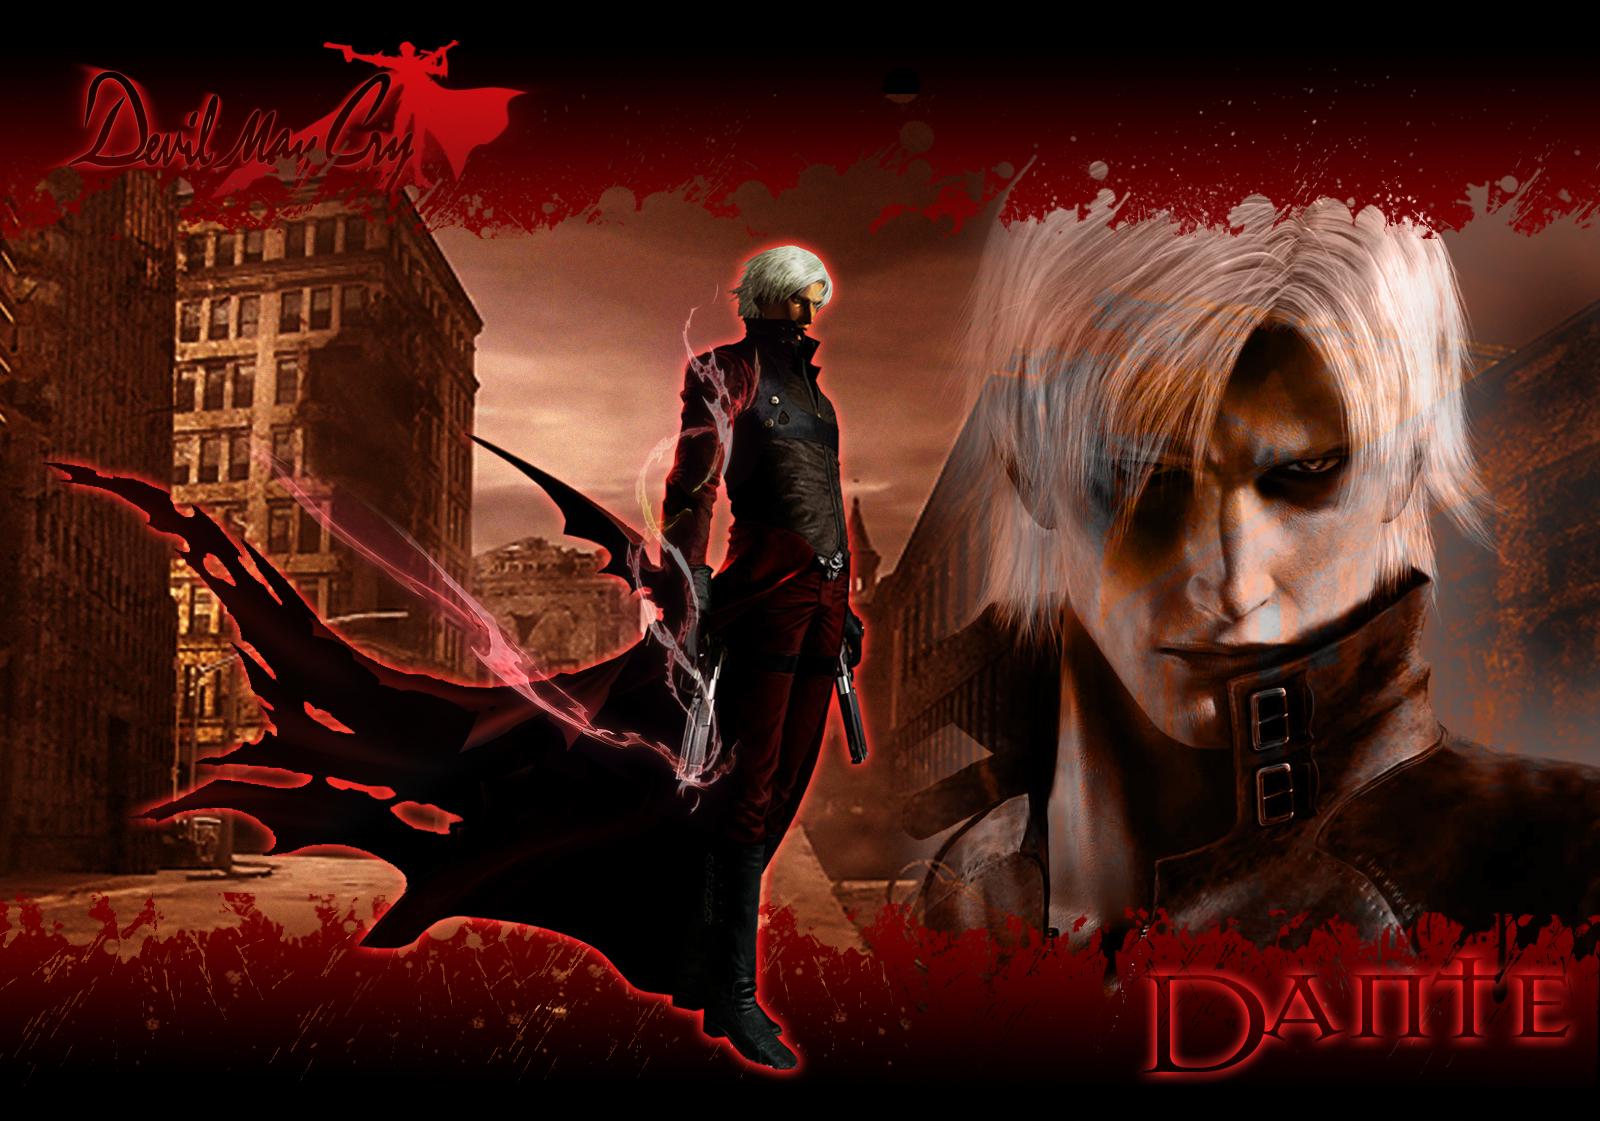 Devil May Cry Dmc D Wallpaper 1600x1121 91724 Wallpaperup